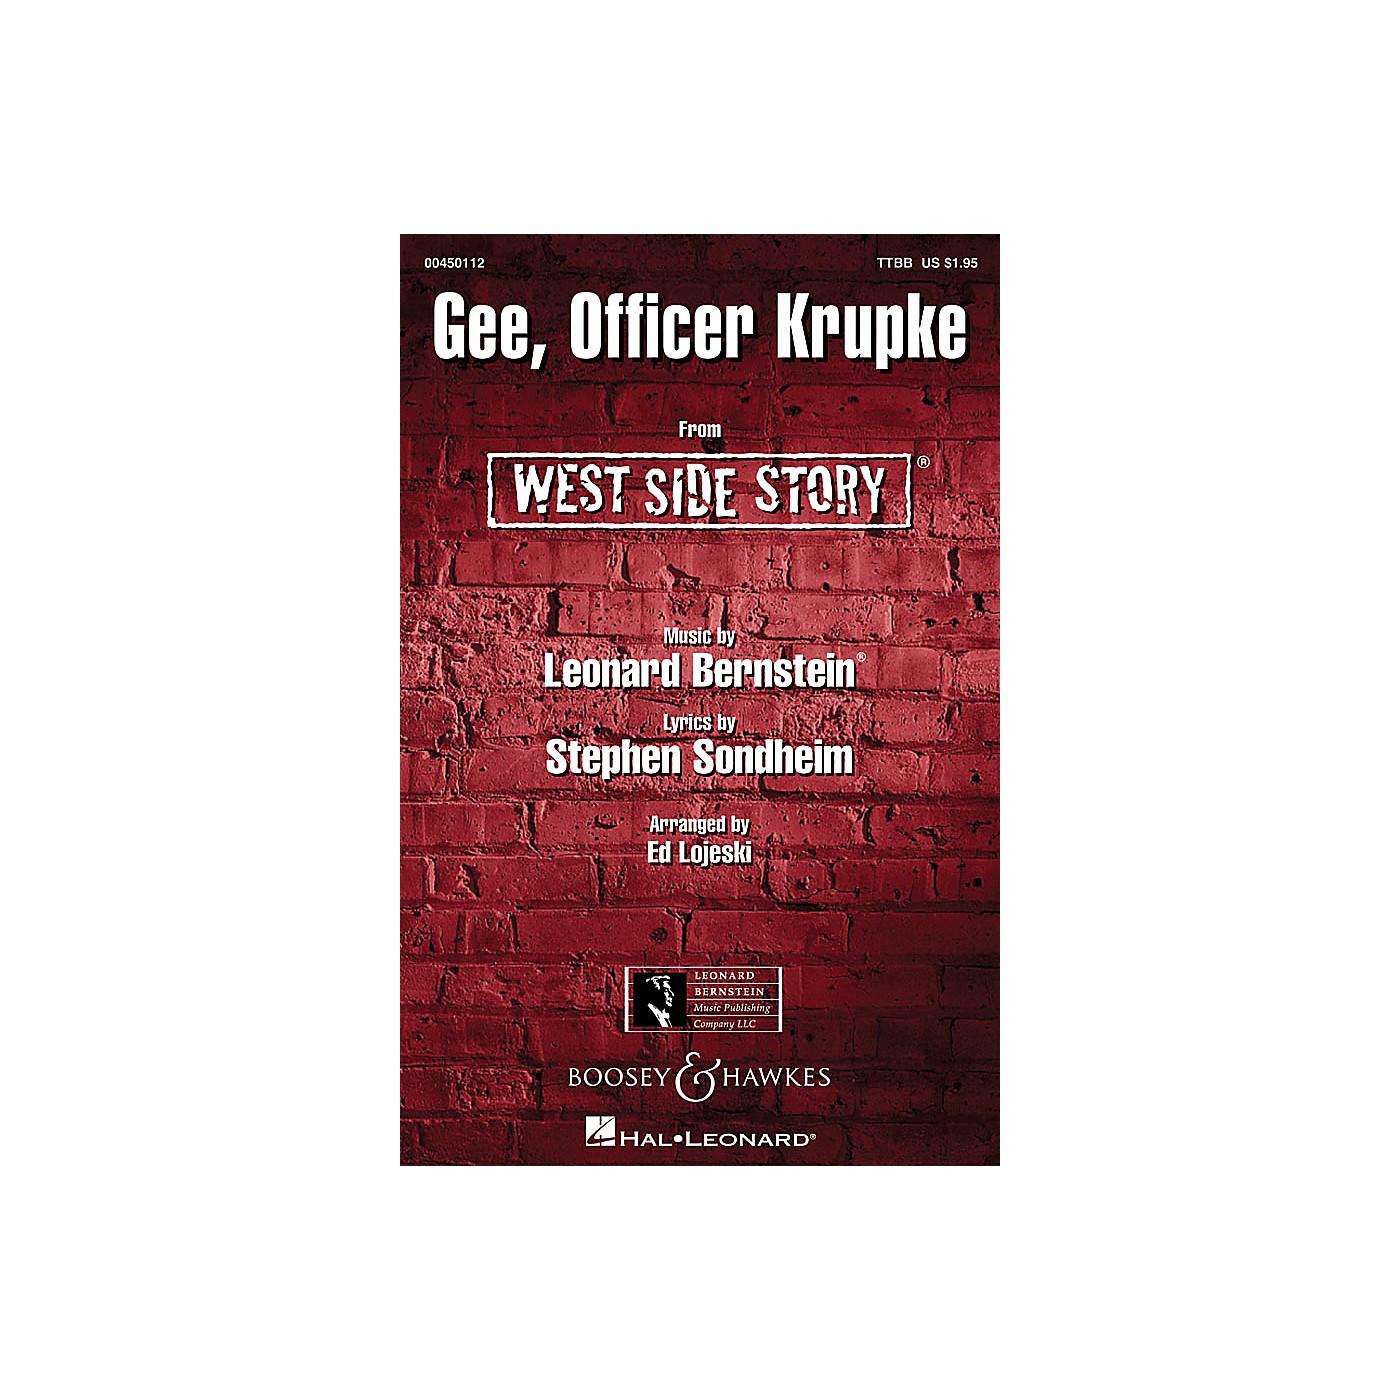 Hal Leonard Gee, Officer Krupke (from West Side Story) ShowTrax CD Arranged by Ed Lojeski thumbnail